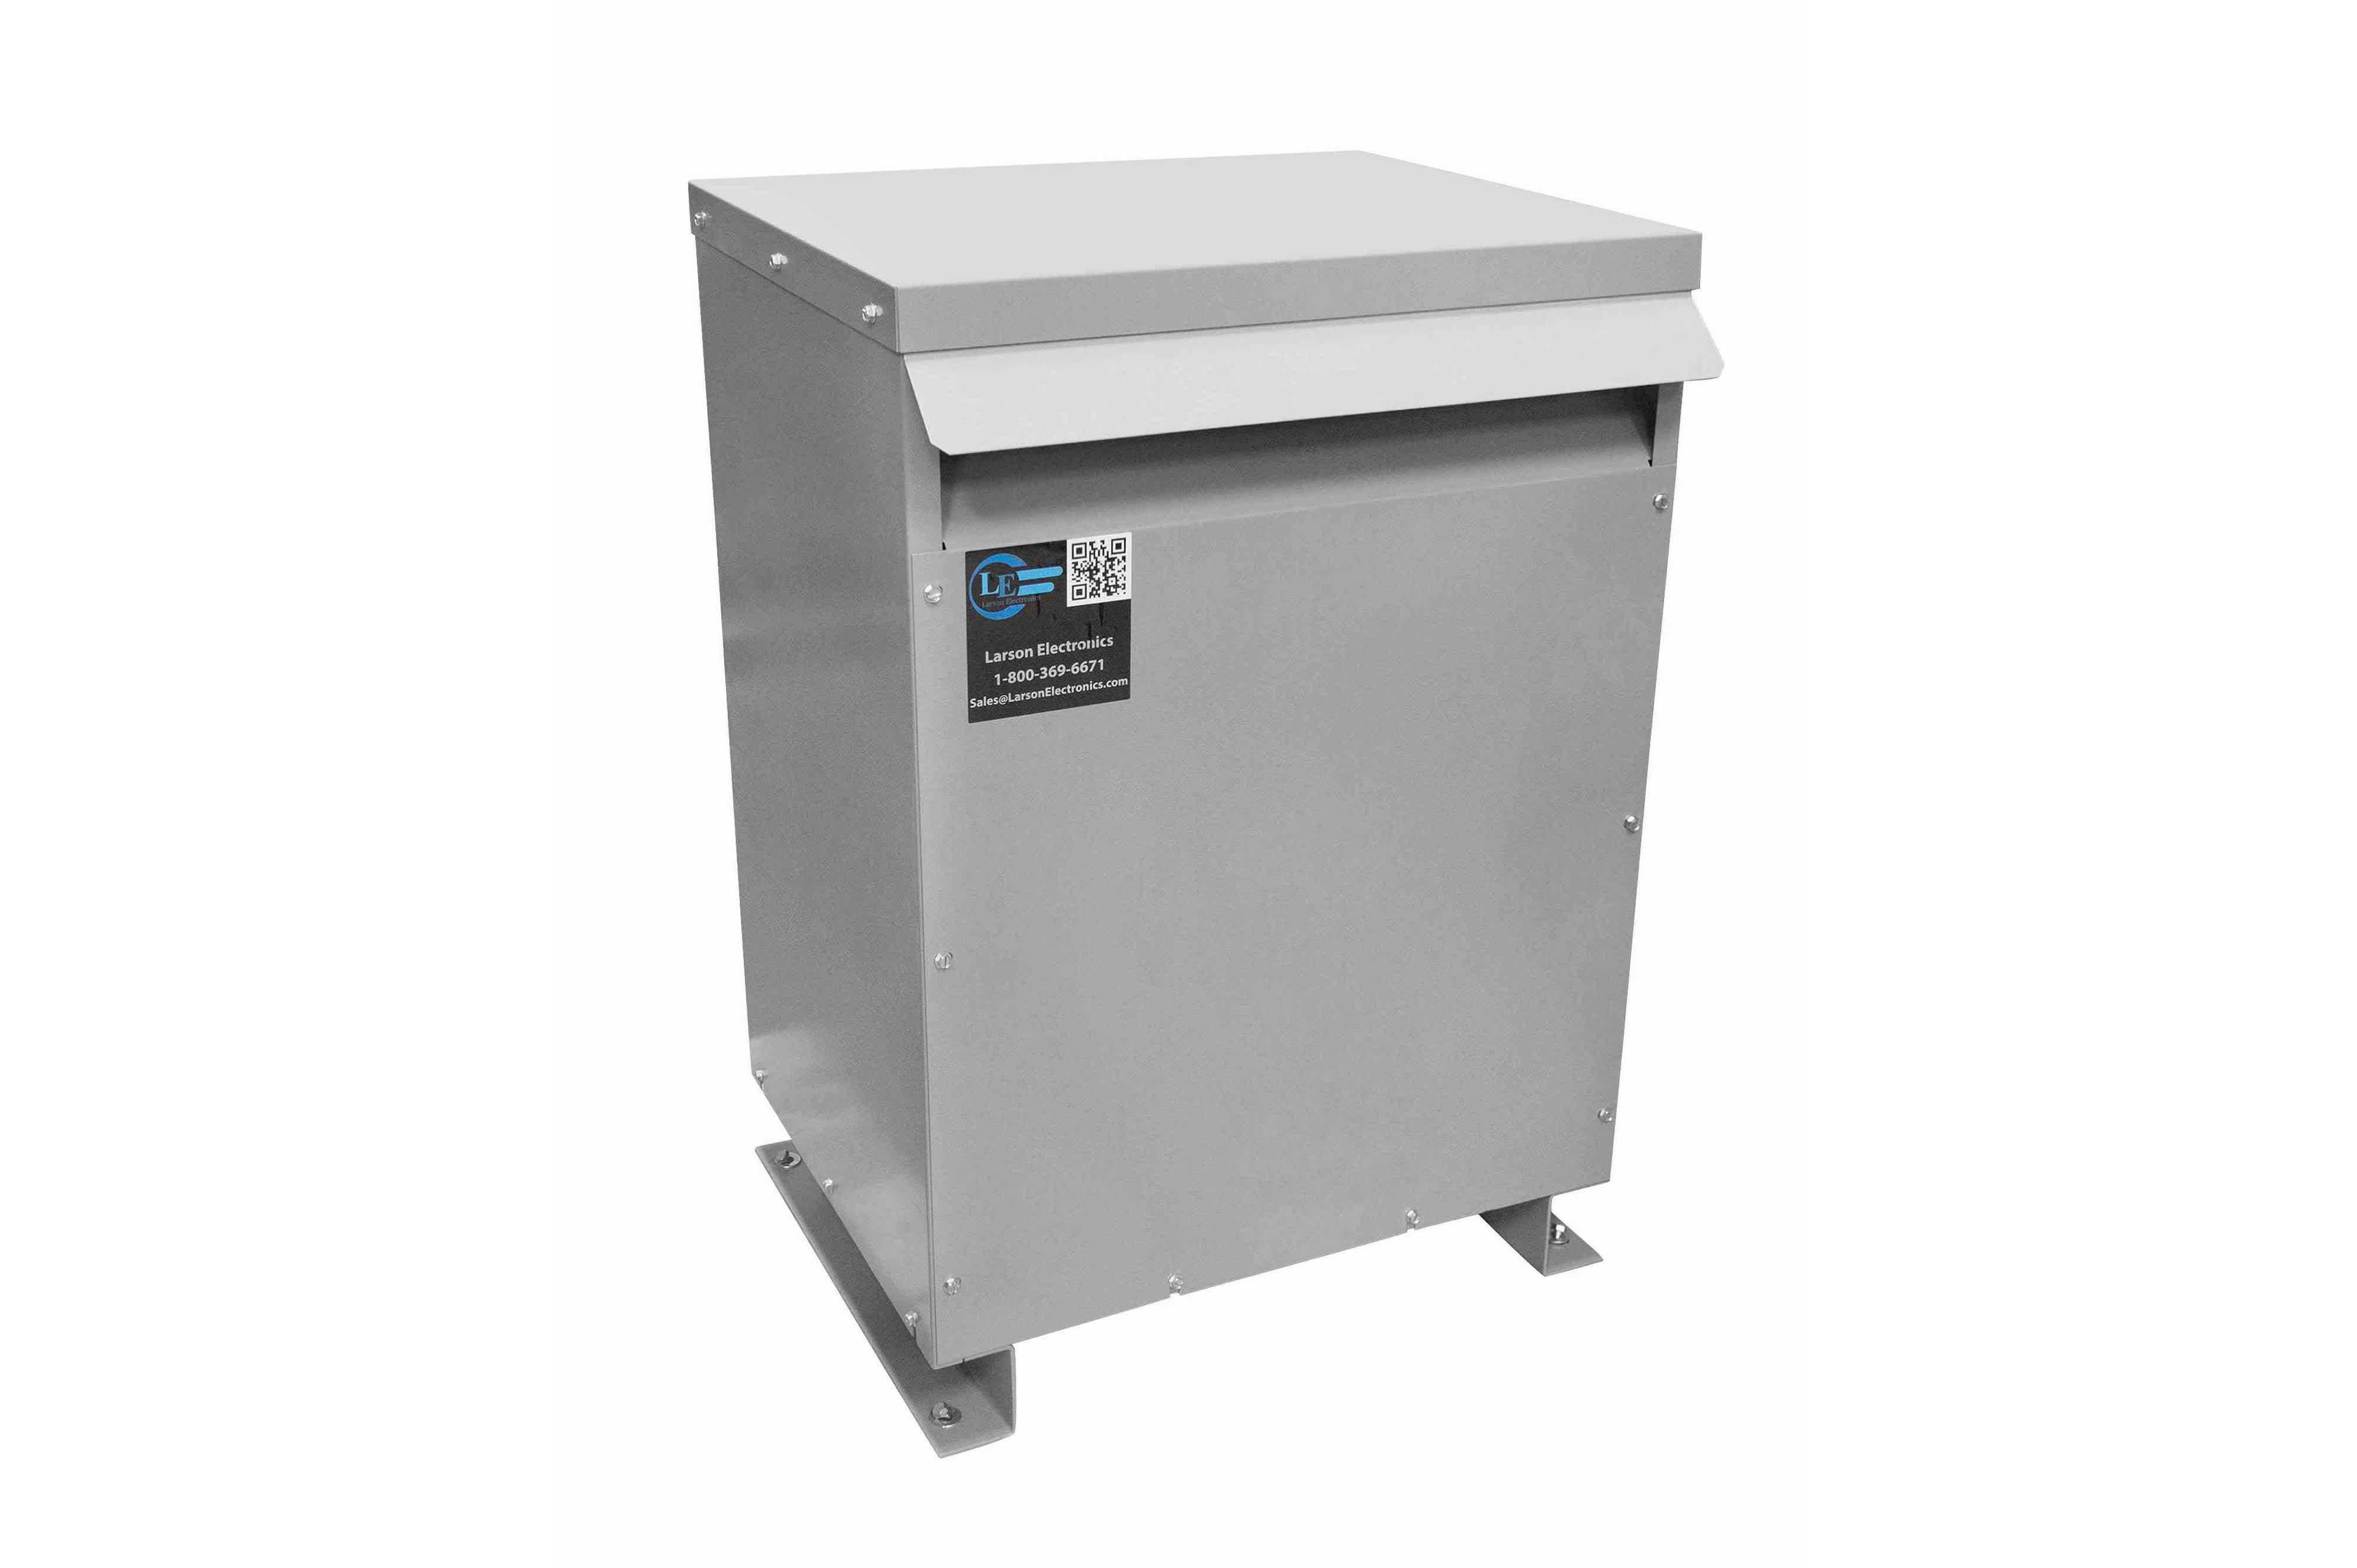 37.5 kVA 3PH Isolation Transformer, 600V Wye Primary, 208V Delta Secondary, N3R, Ventilated, 60 Hz